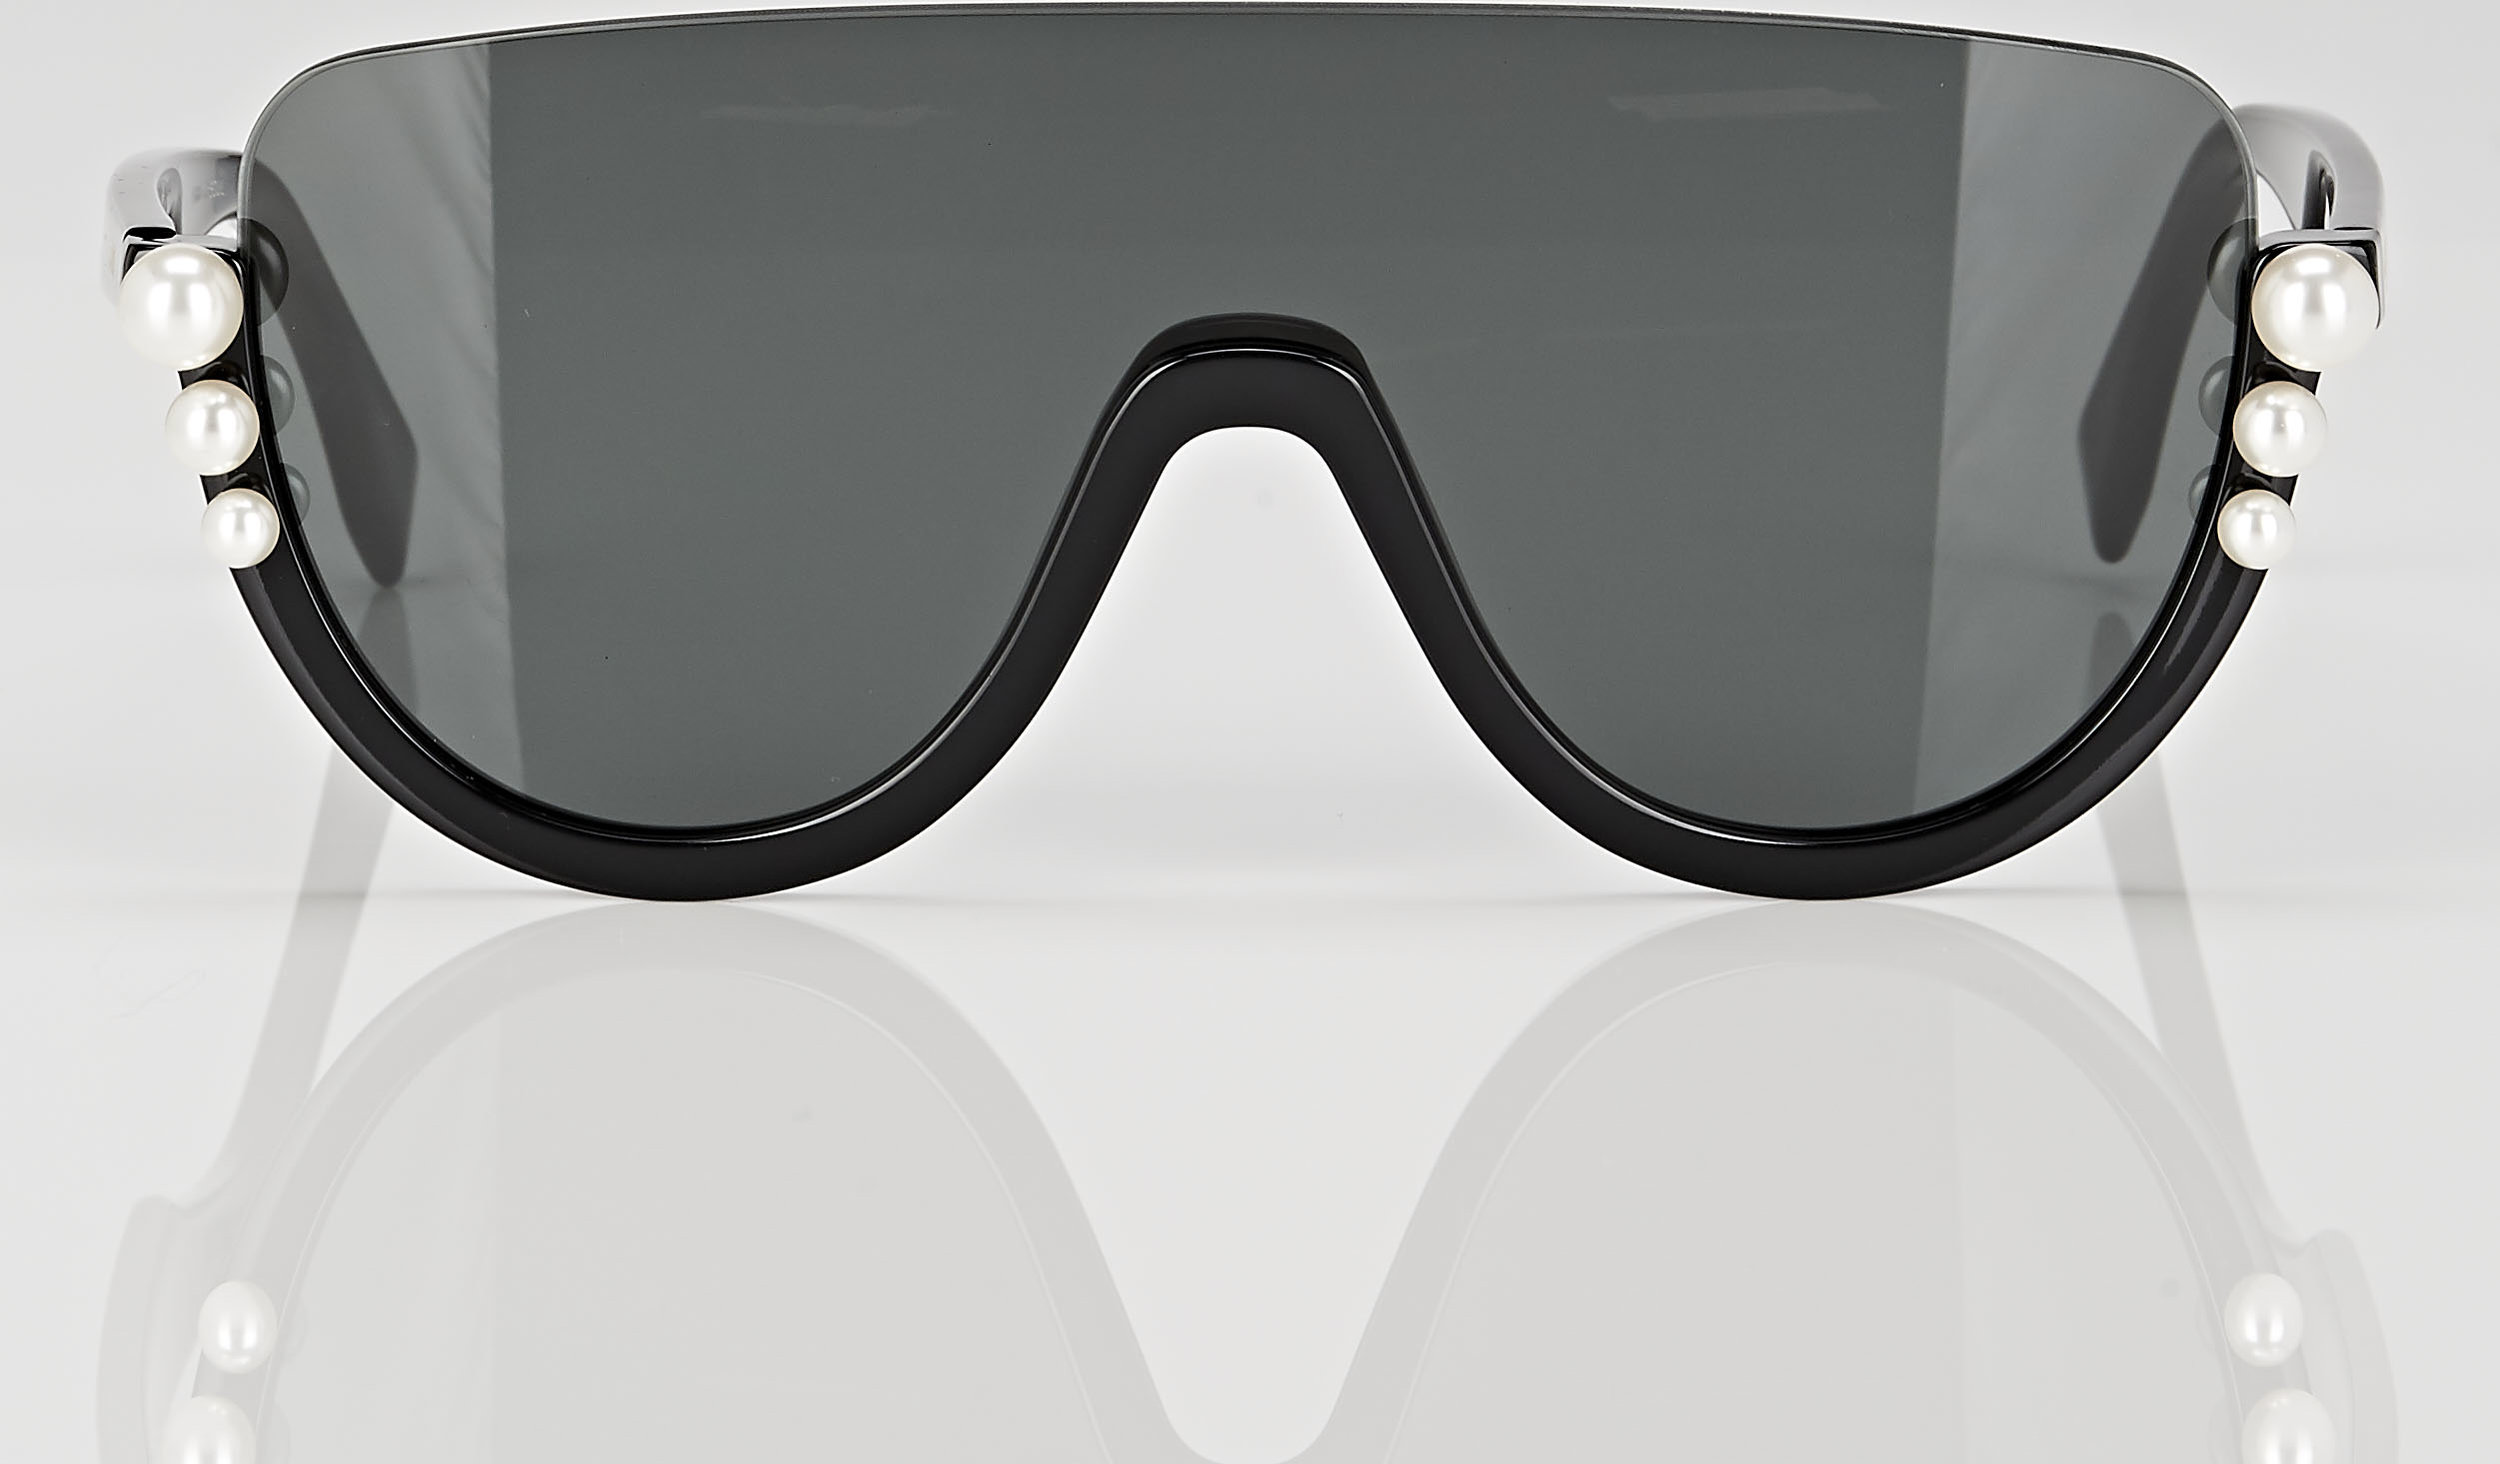 505631771_1_SunglassesFrontb.jpg